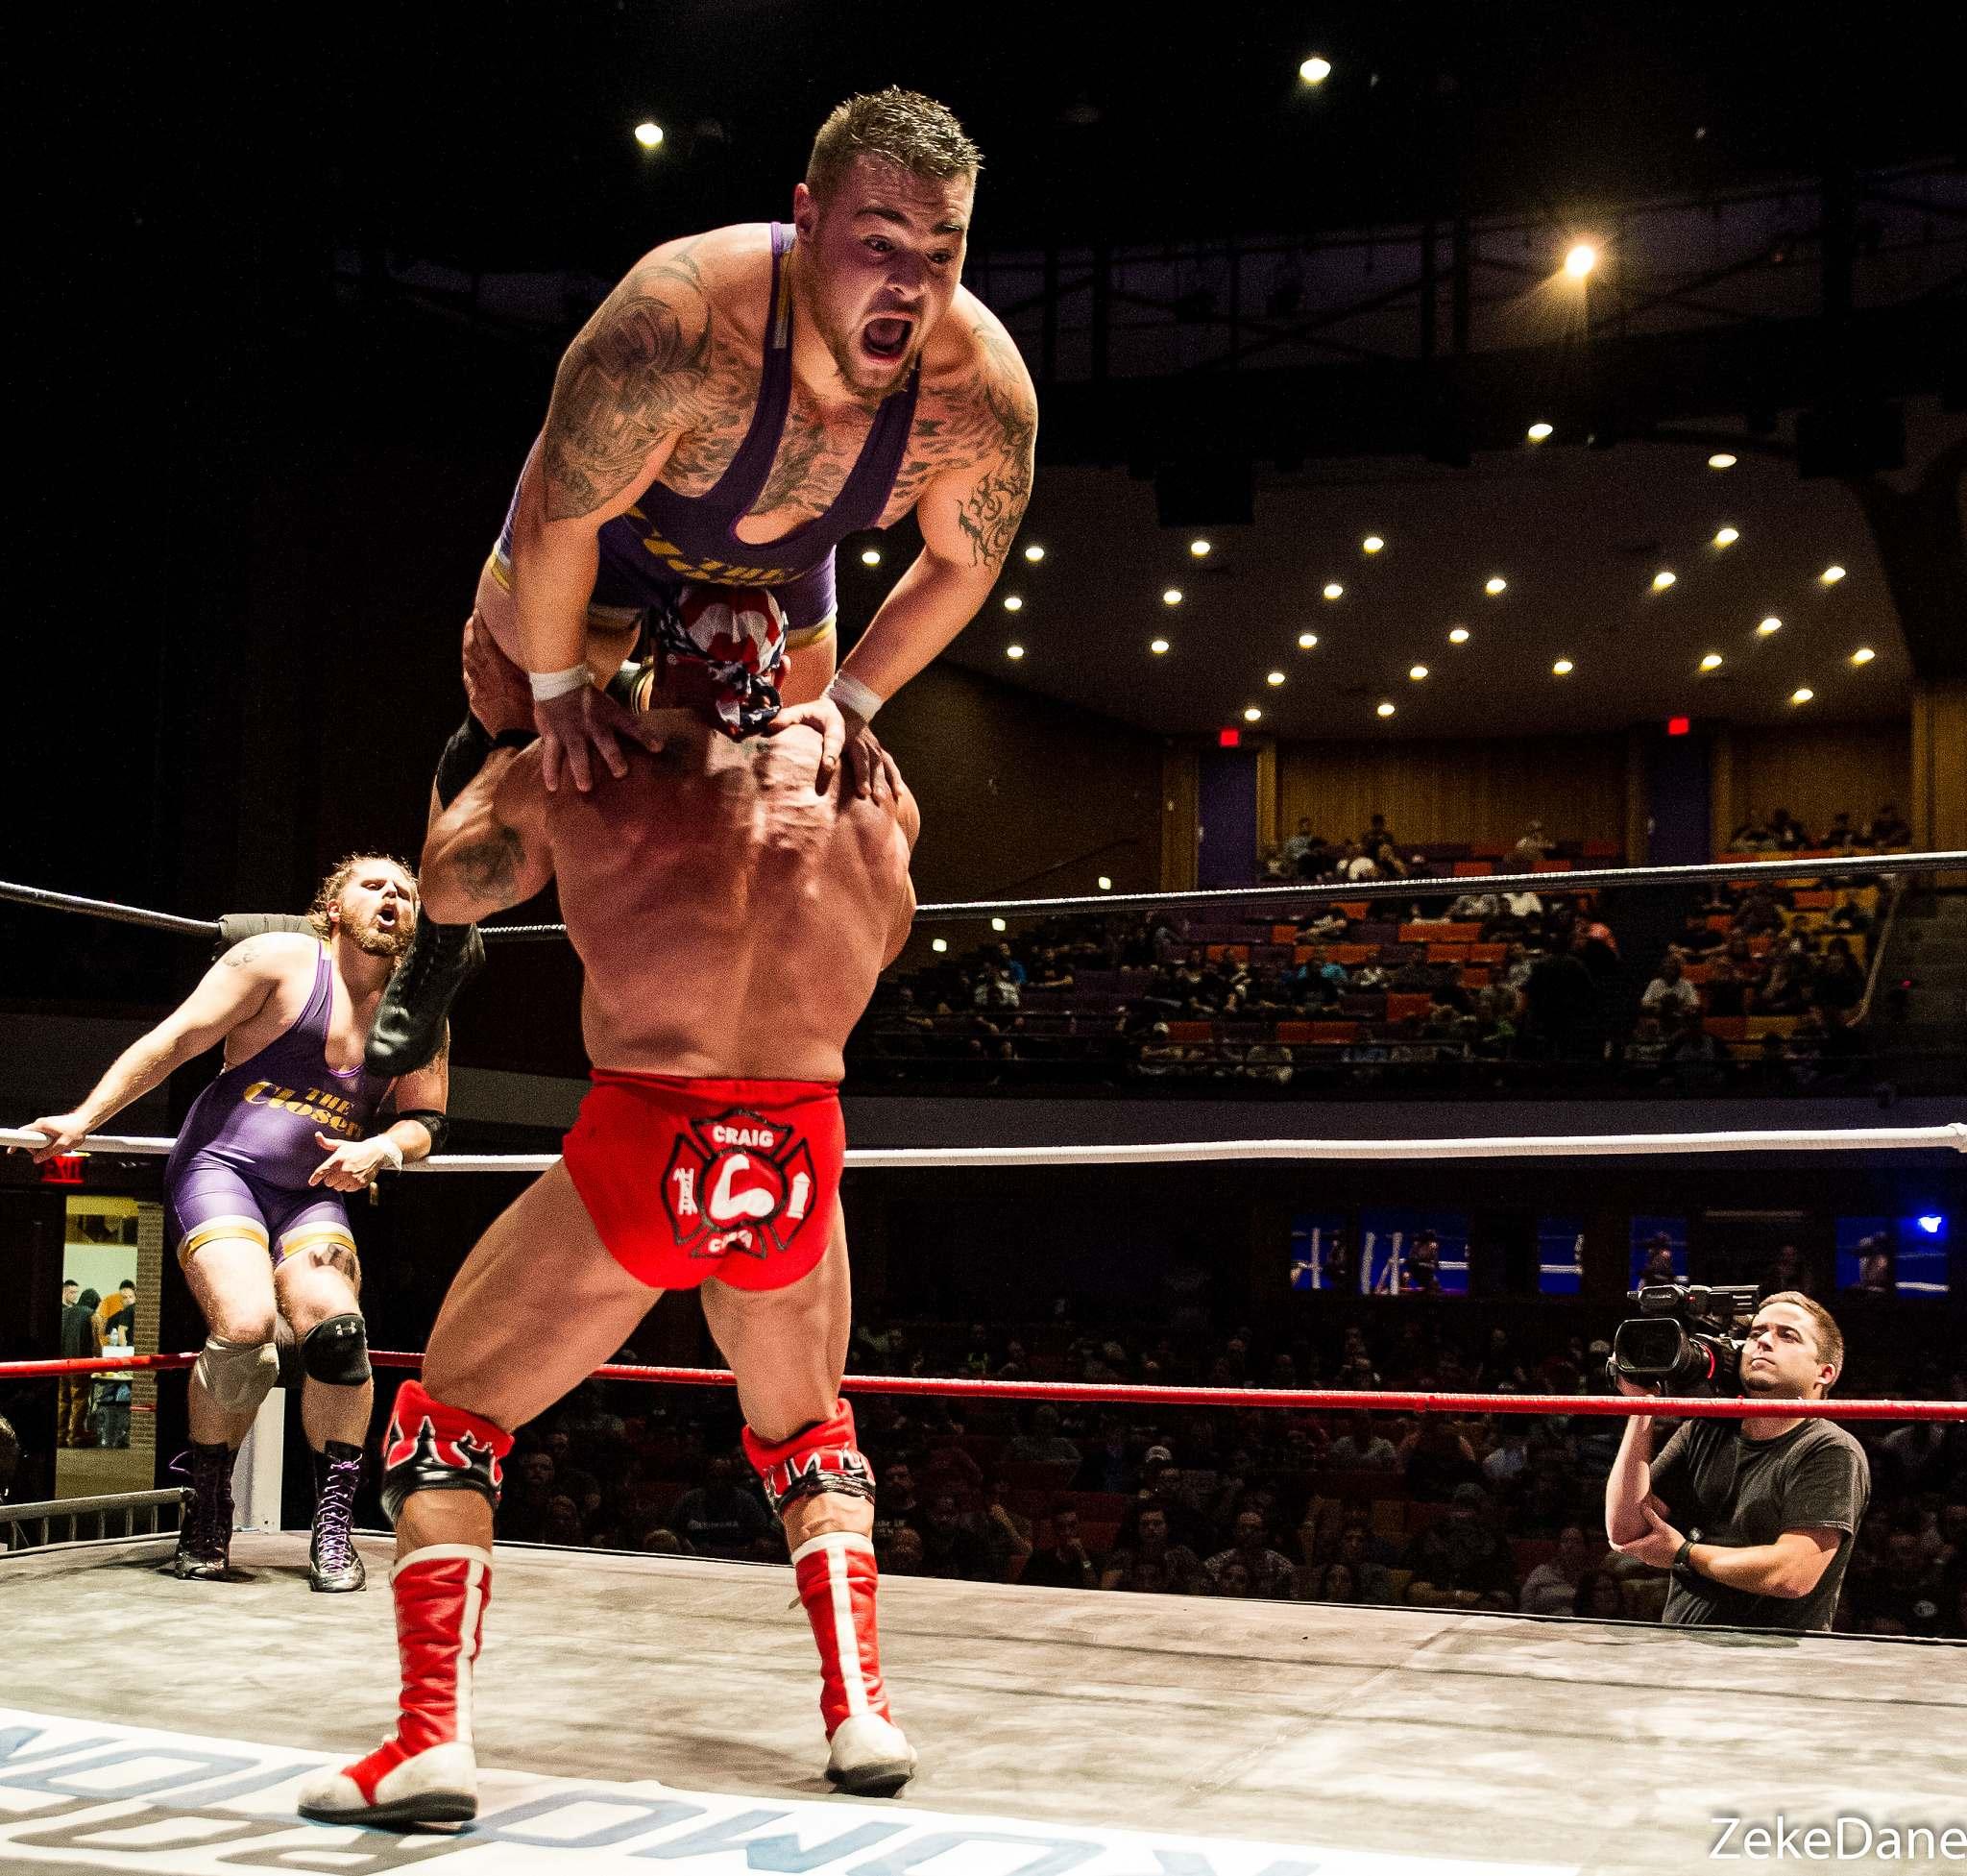 pro wrestling10 Pro Wrestling in New England 2016